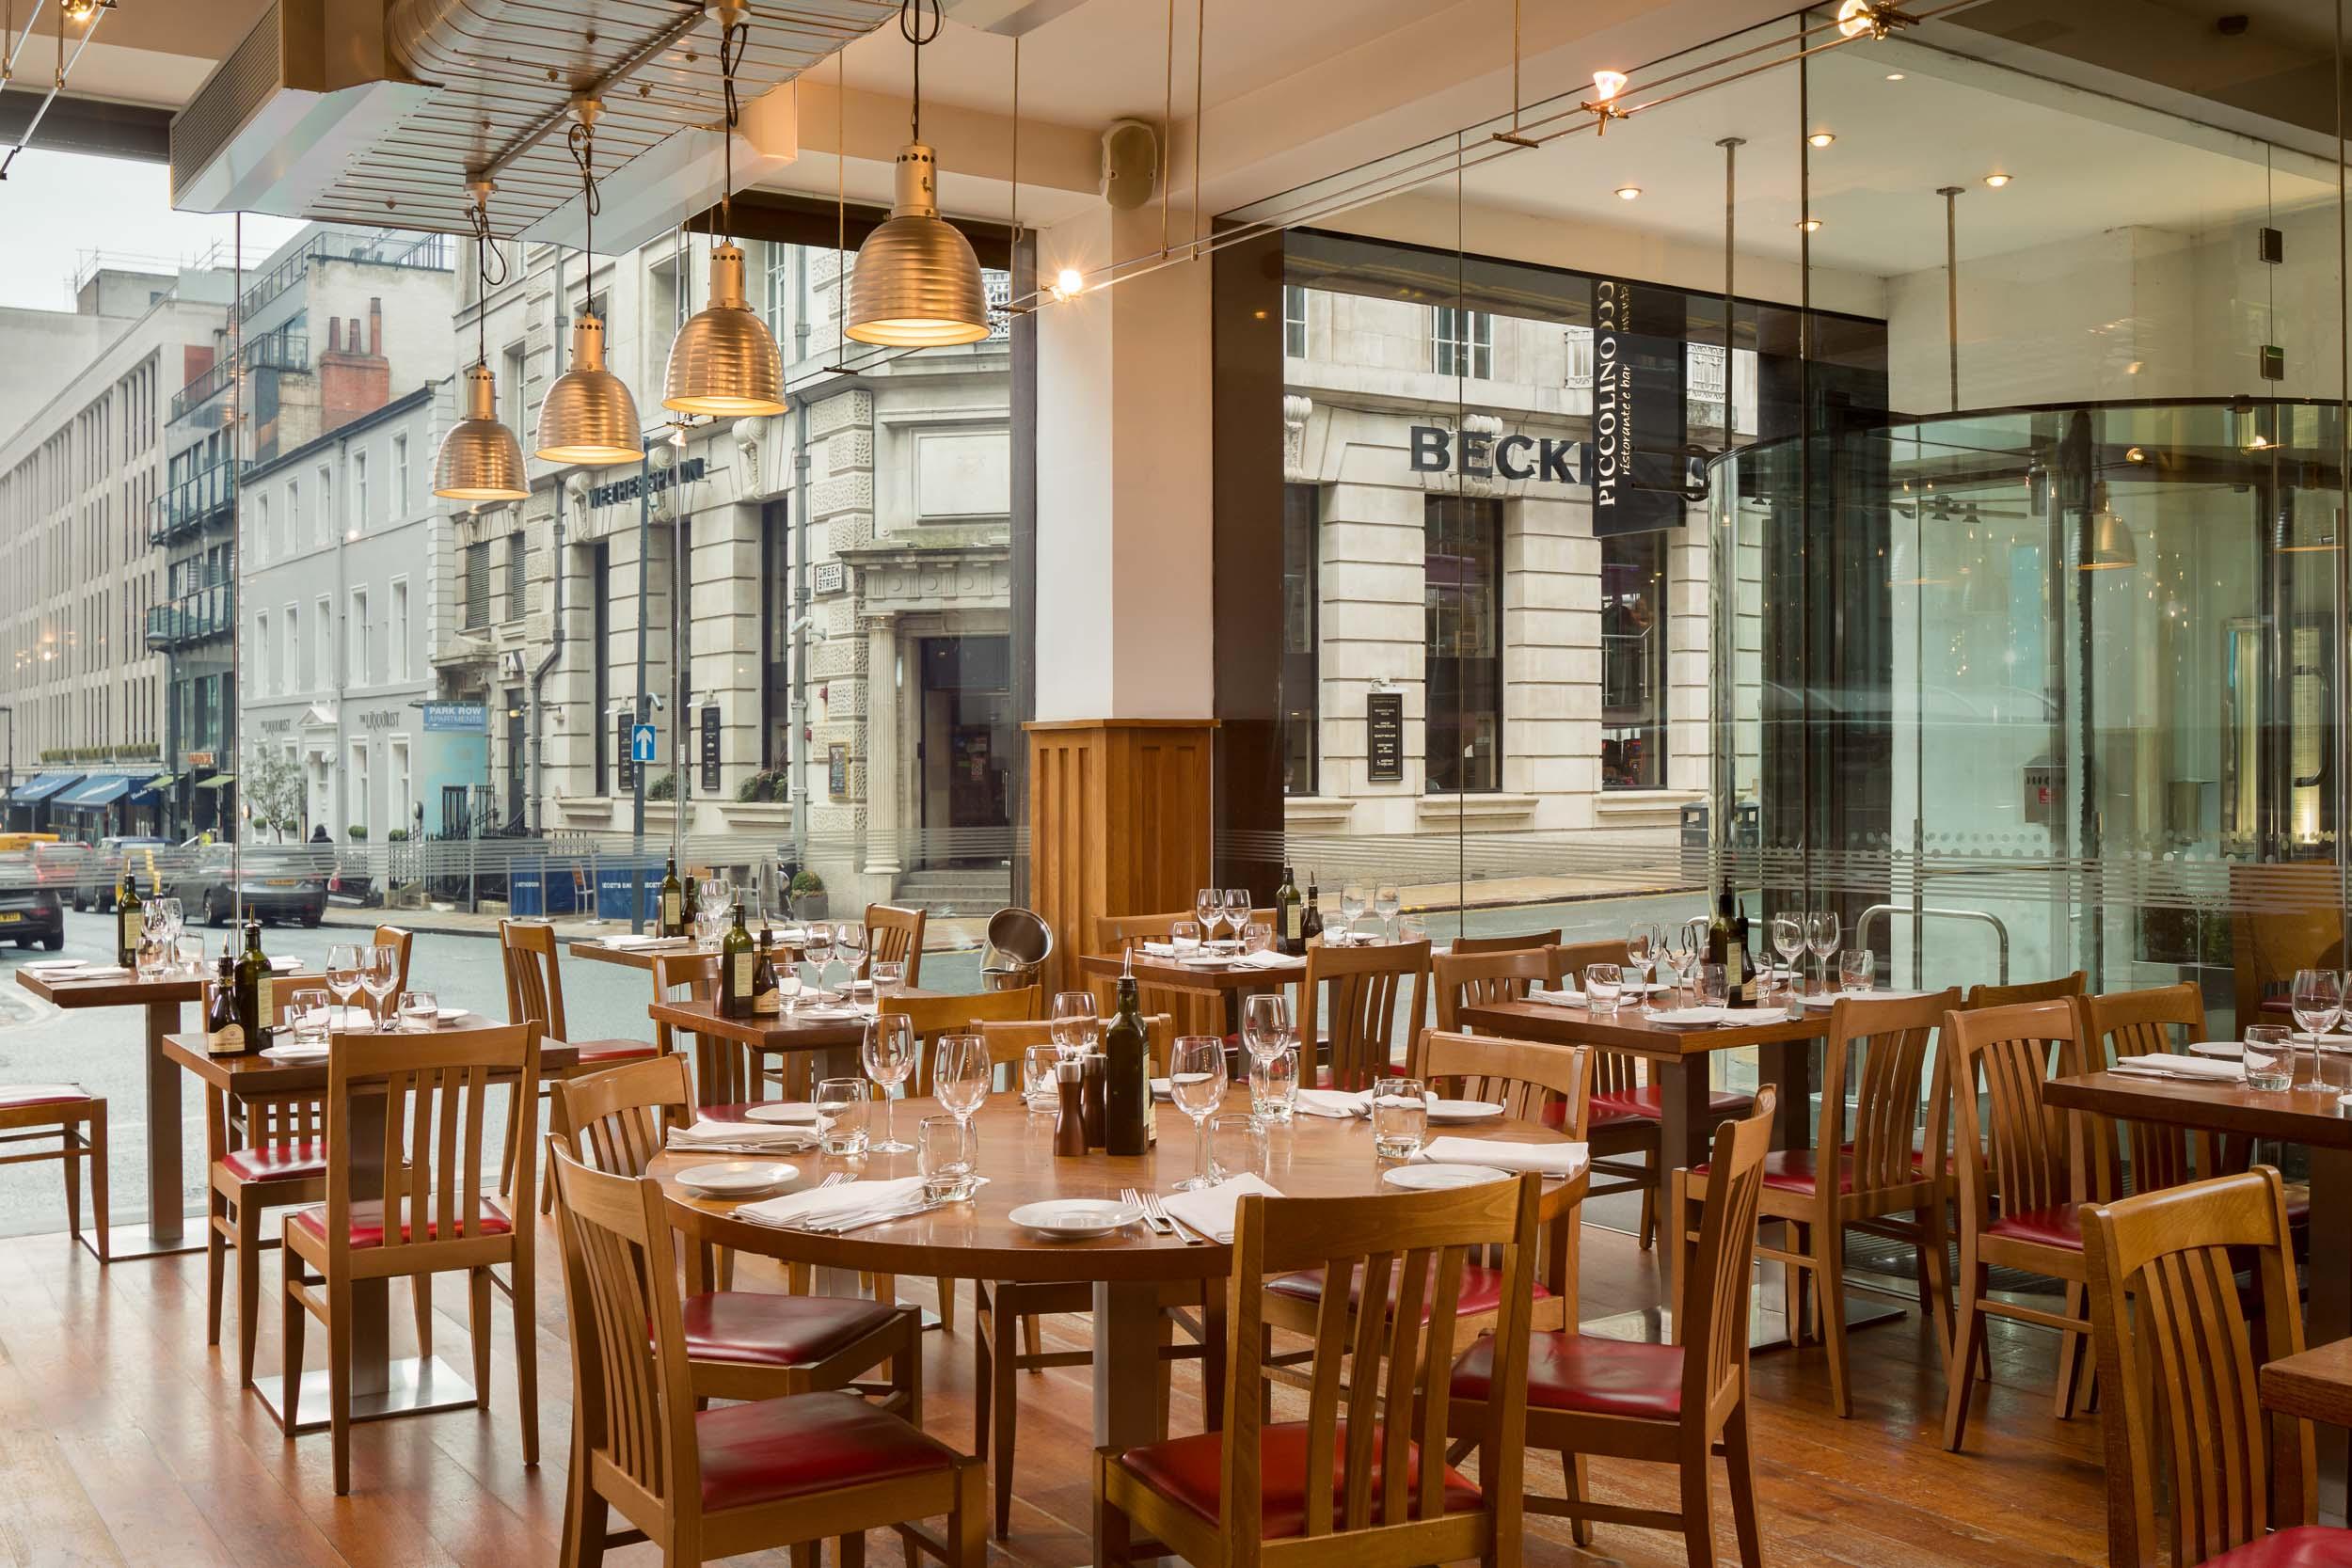 piccolino leeds commercial restaurant interior after.jpg